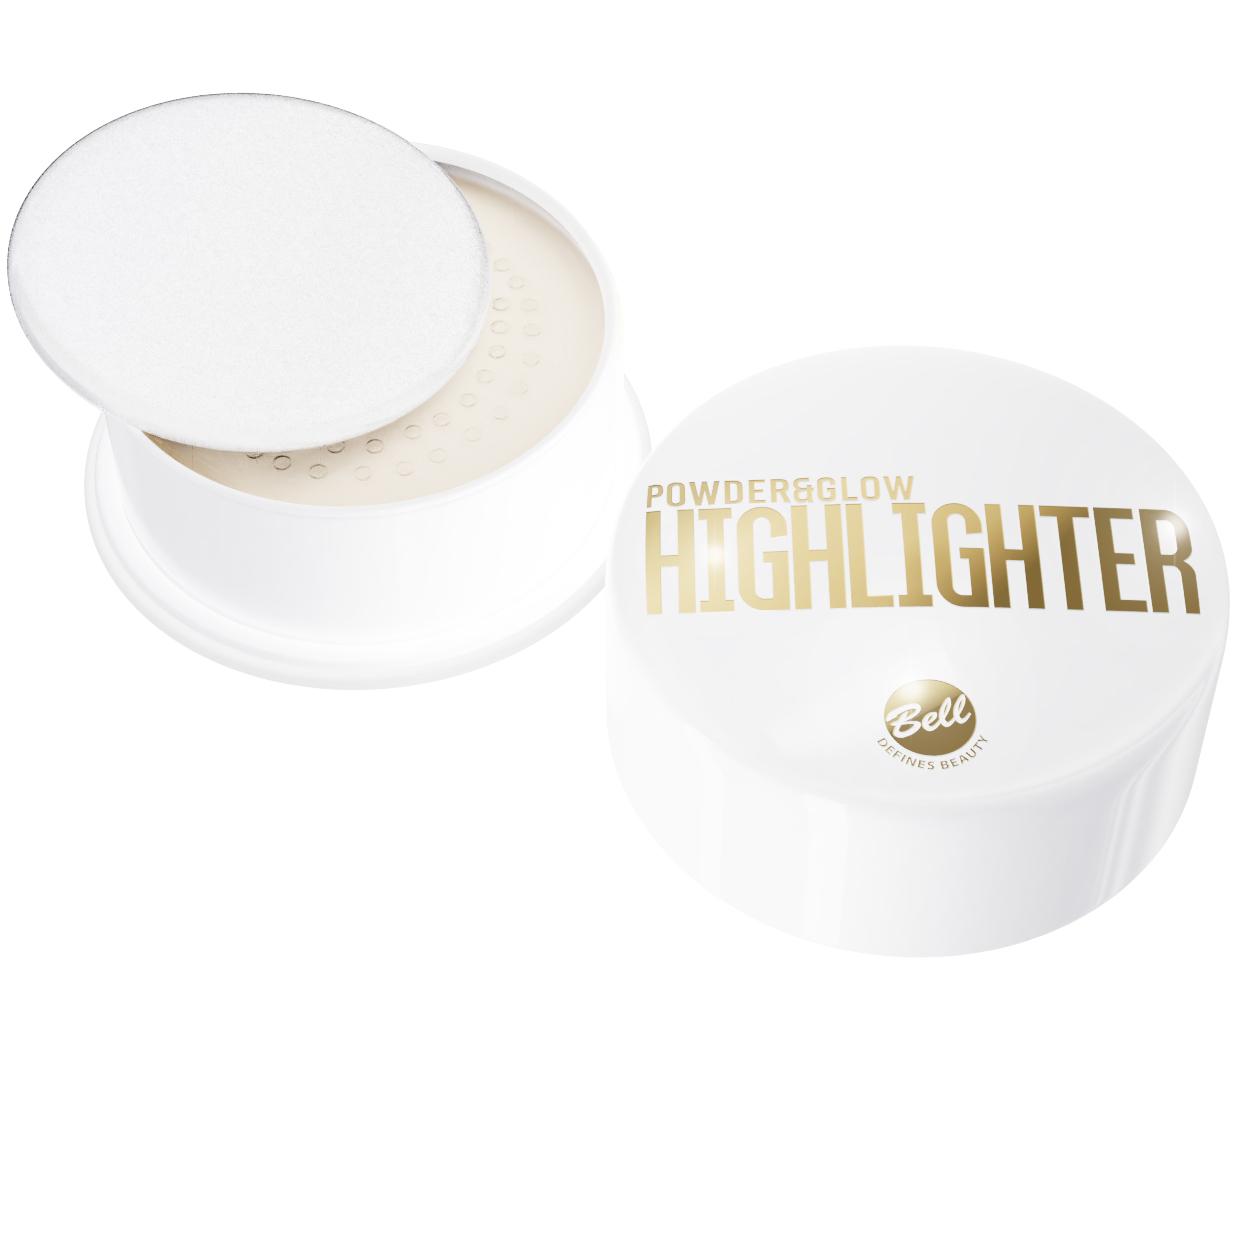 Powder&Glow Highlighter